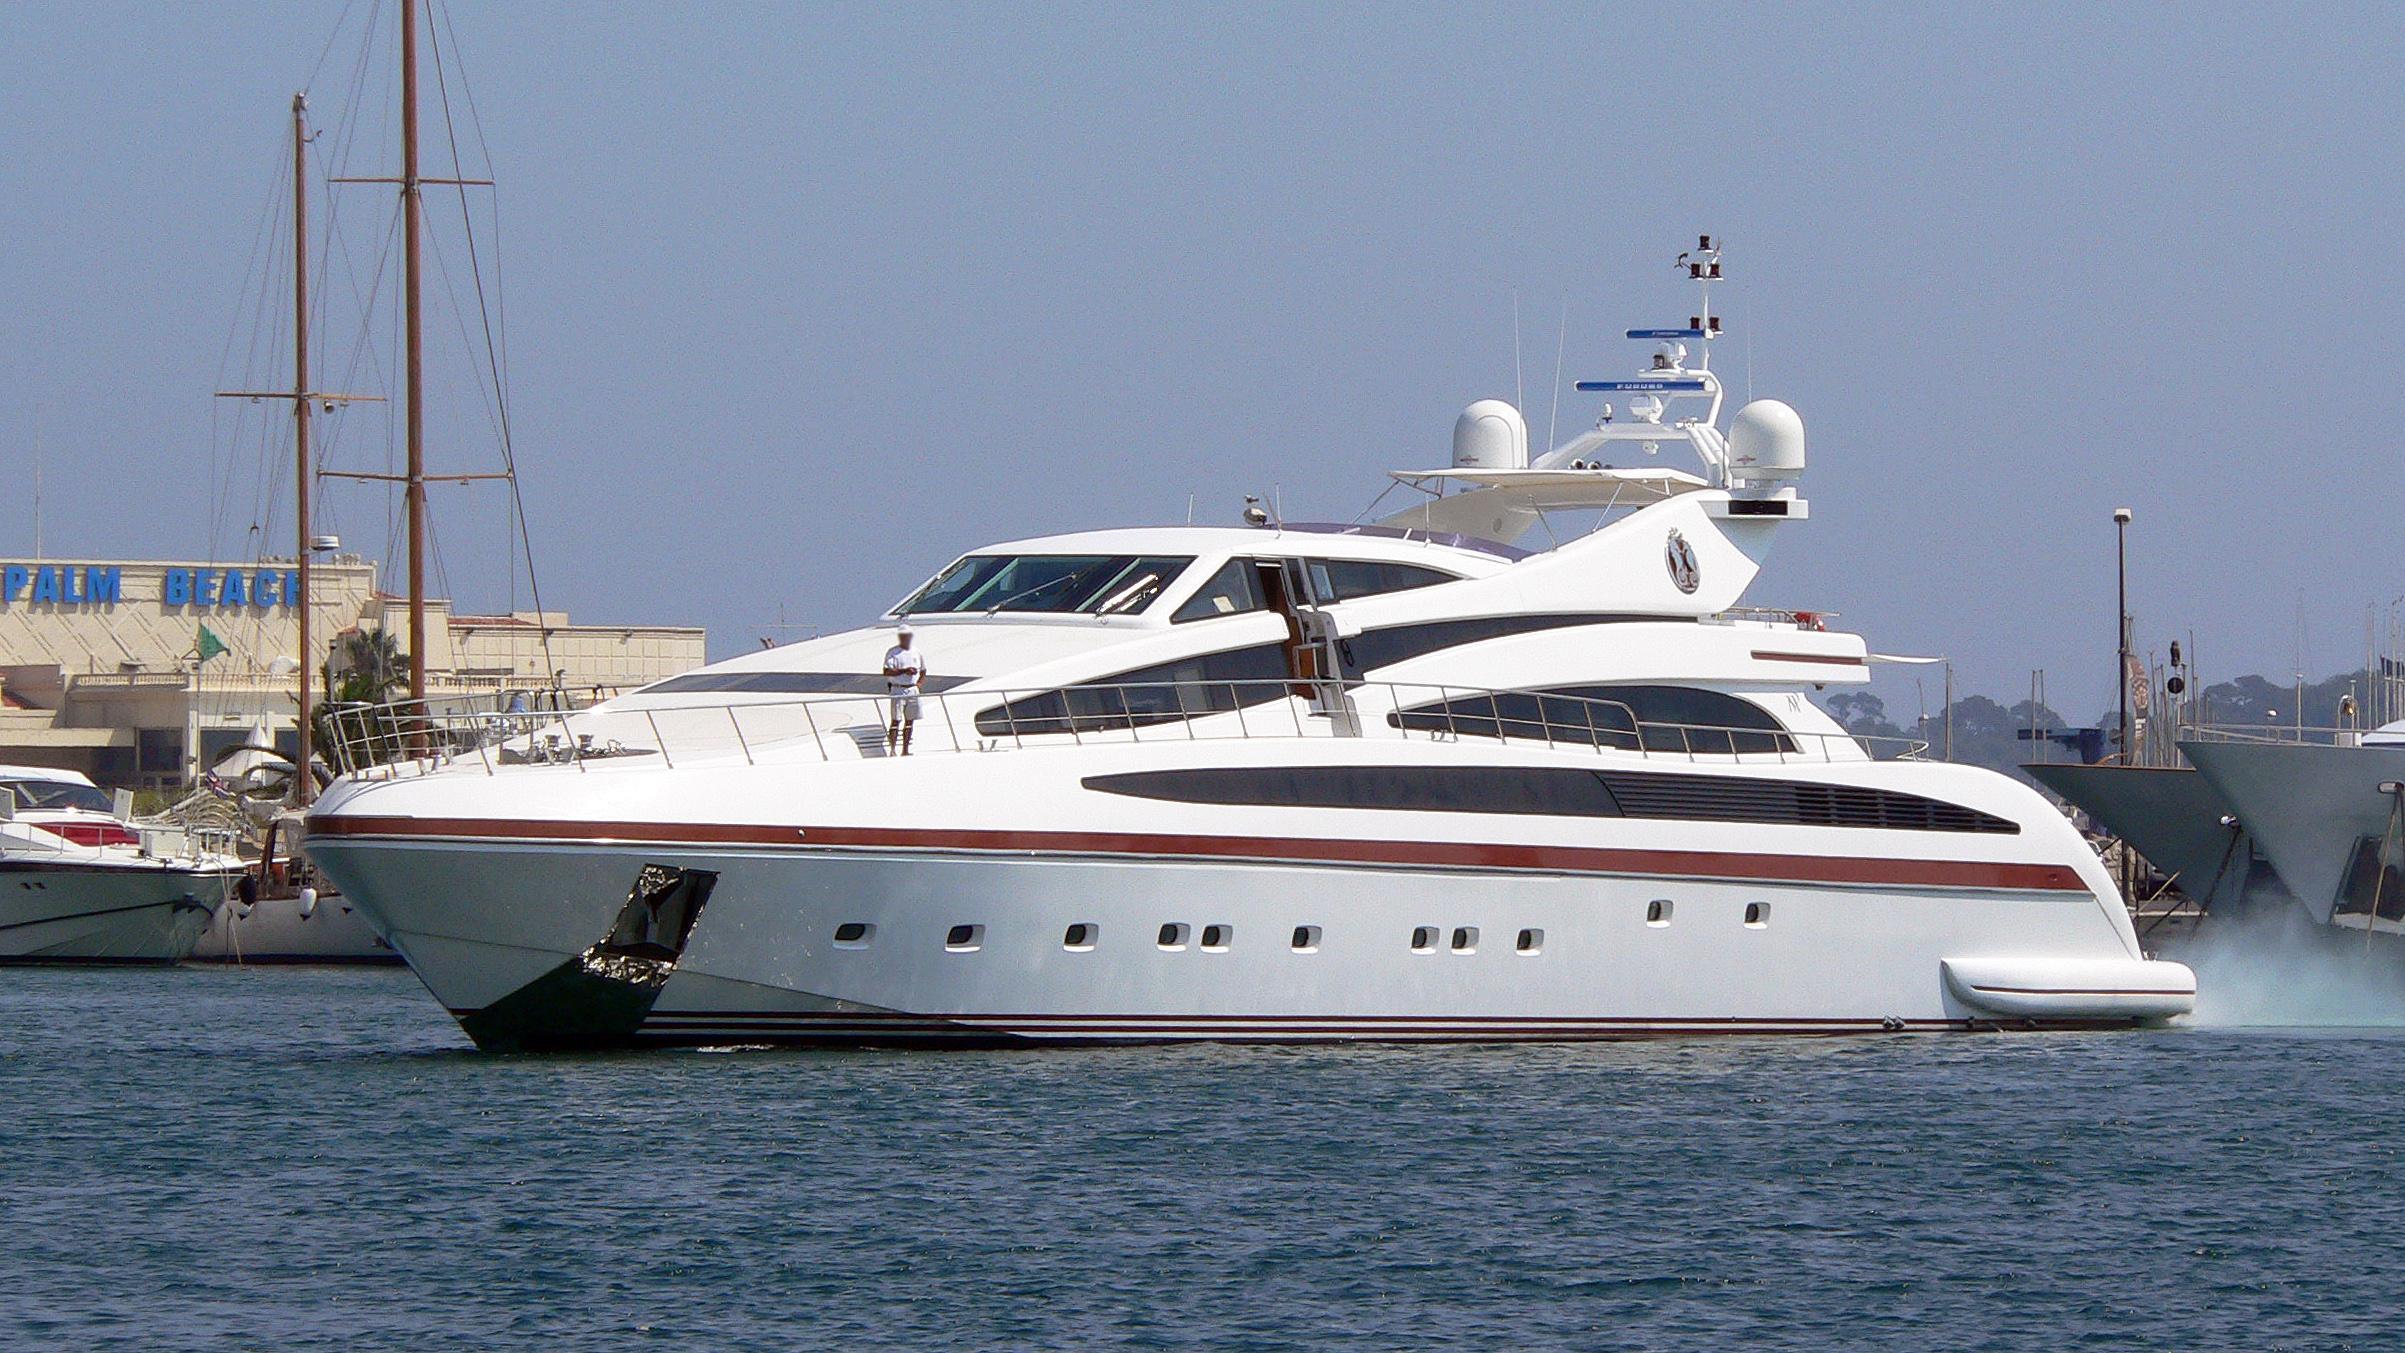 samja-motor-yacht-isa-133-2004-41m-cruising-half-profile